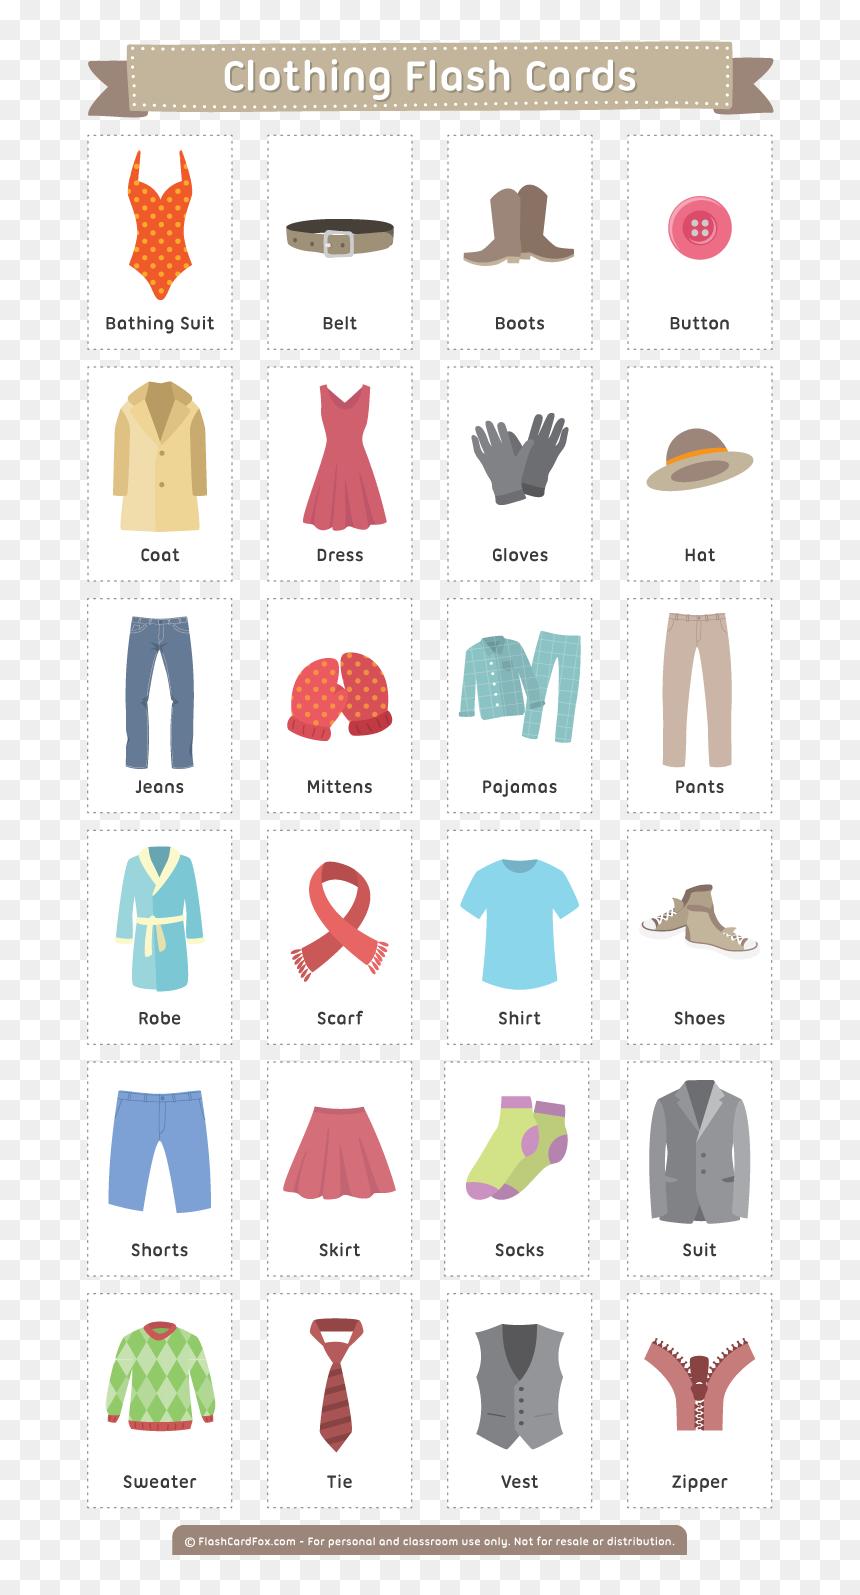 Free Printable Clothing Flash Cards - Spanish Body Parts ...